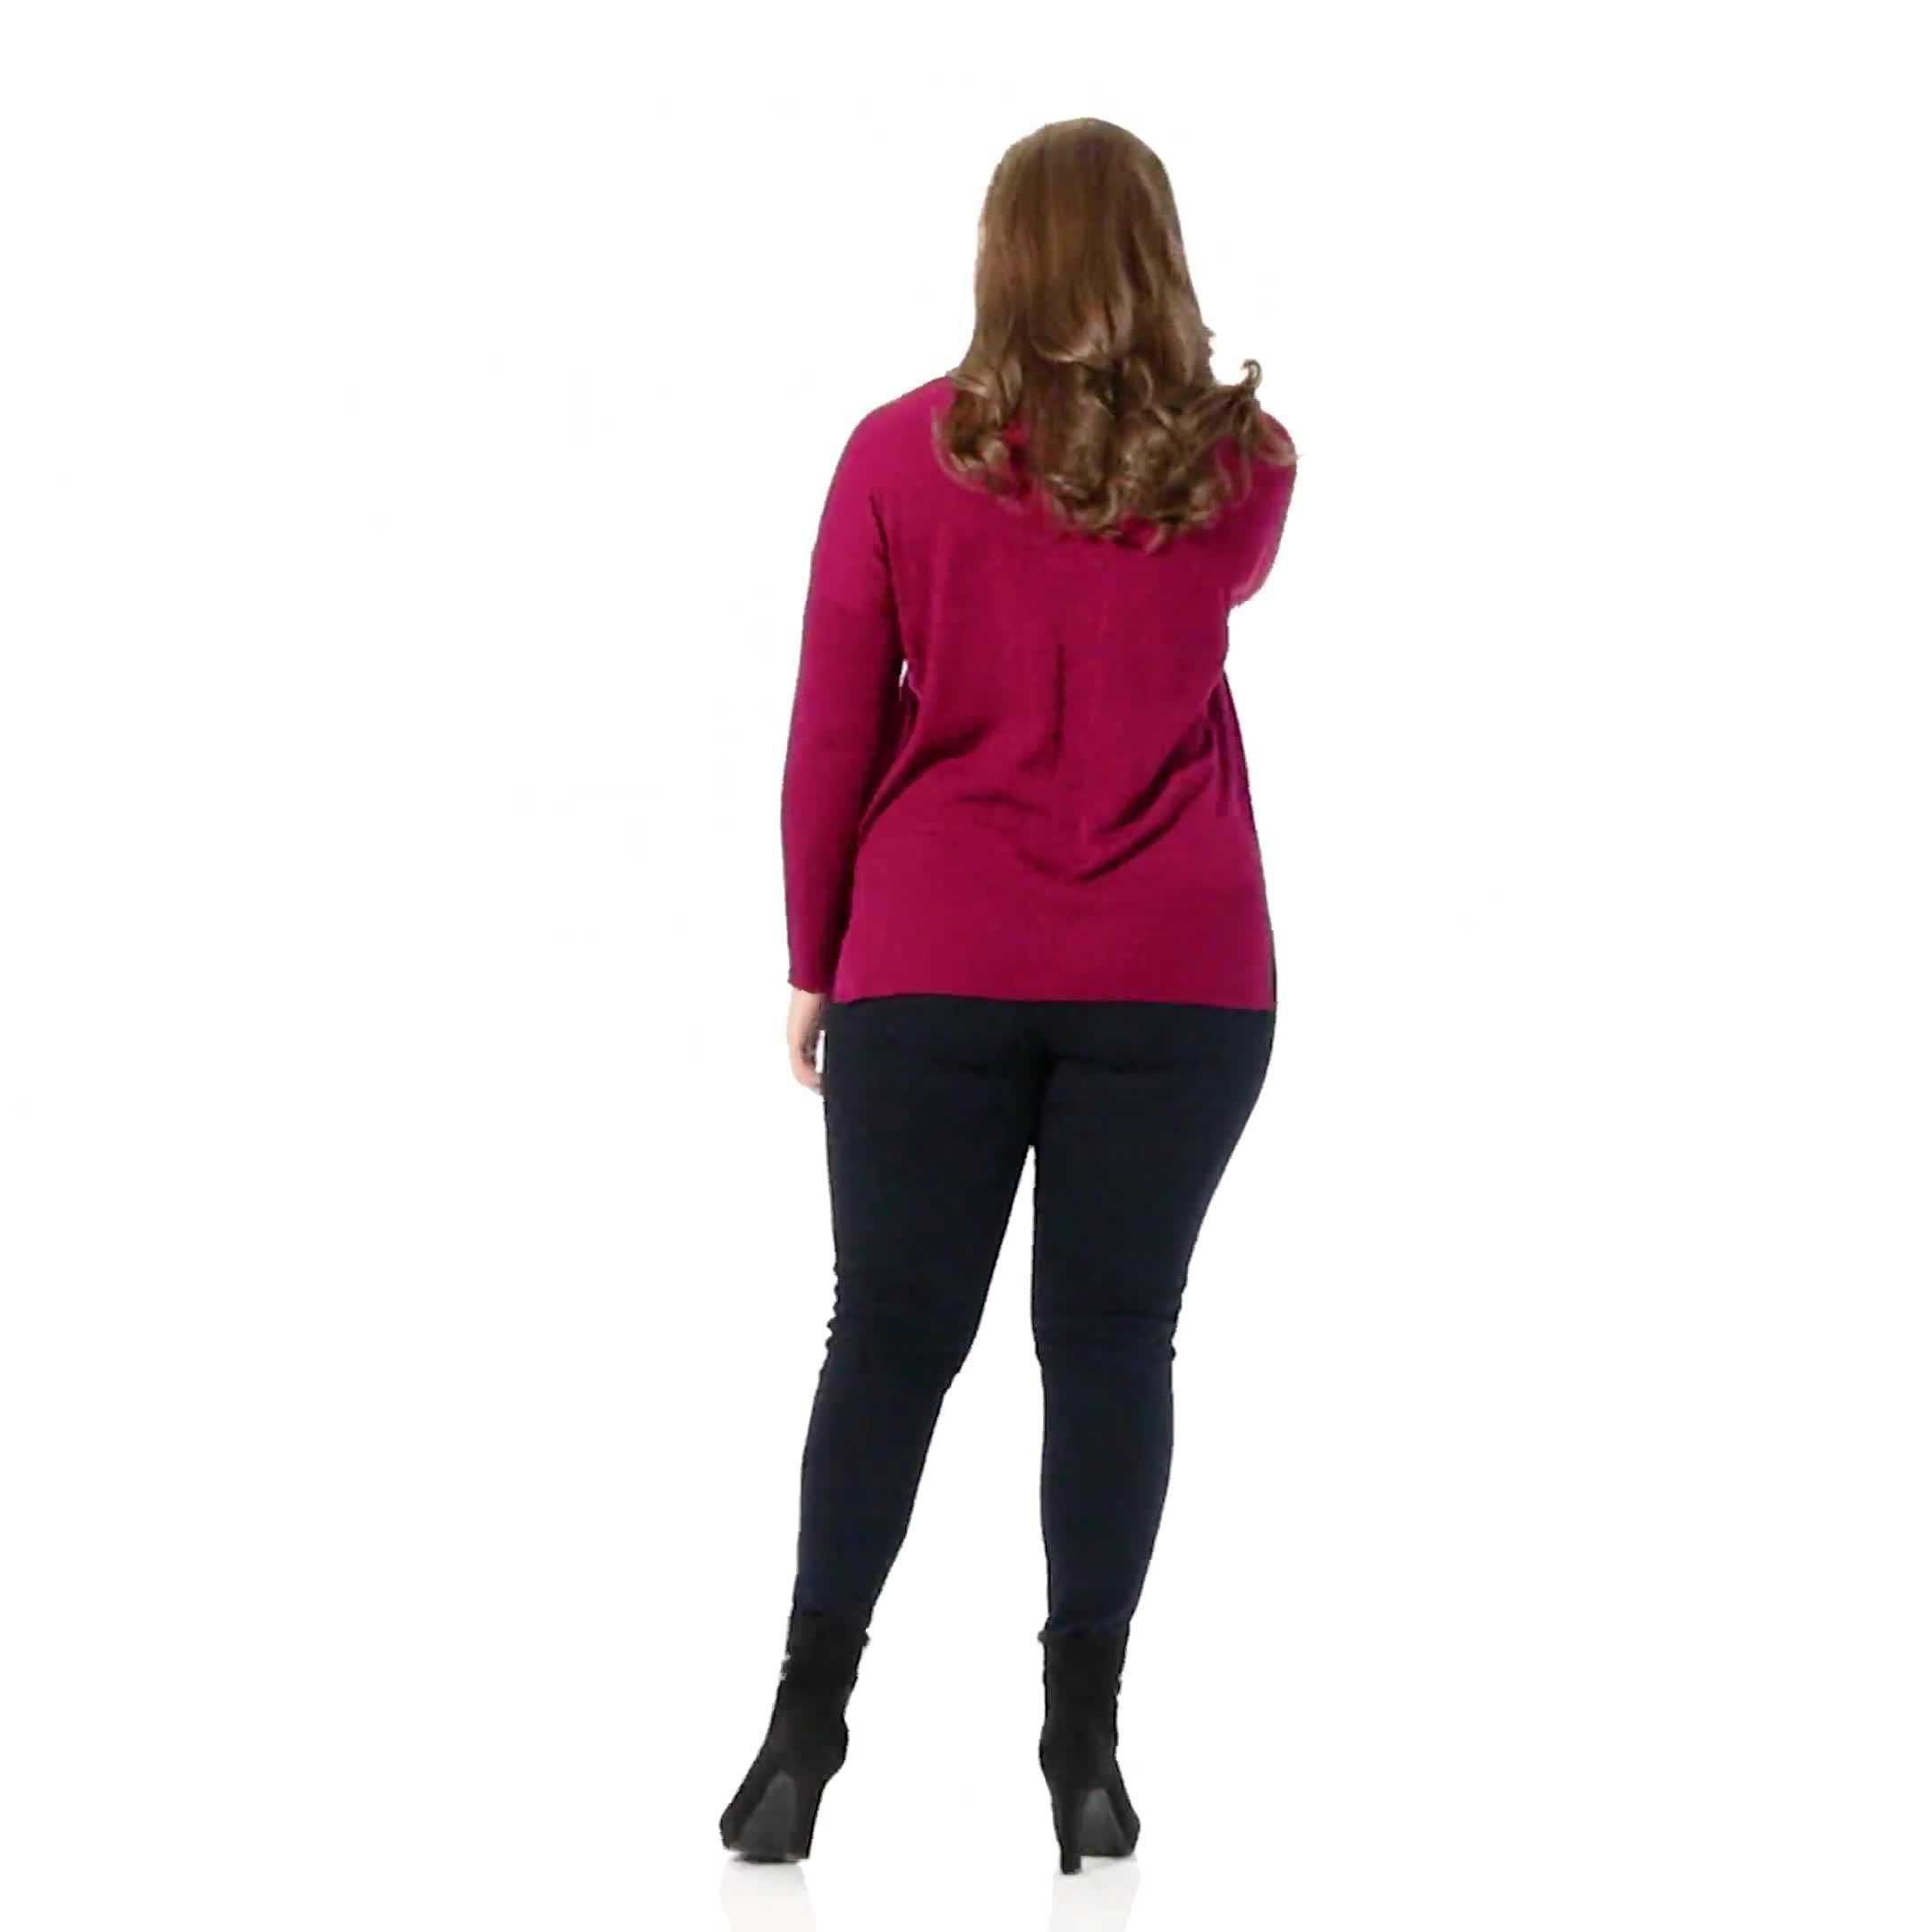 Roz & Ali Beaded Sweater Tunic - Plus - Video